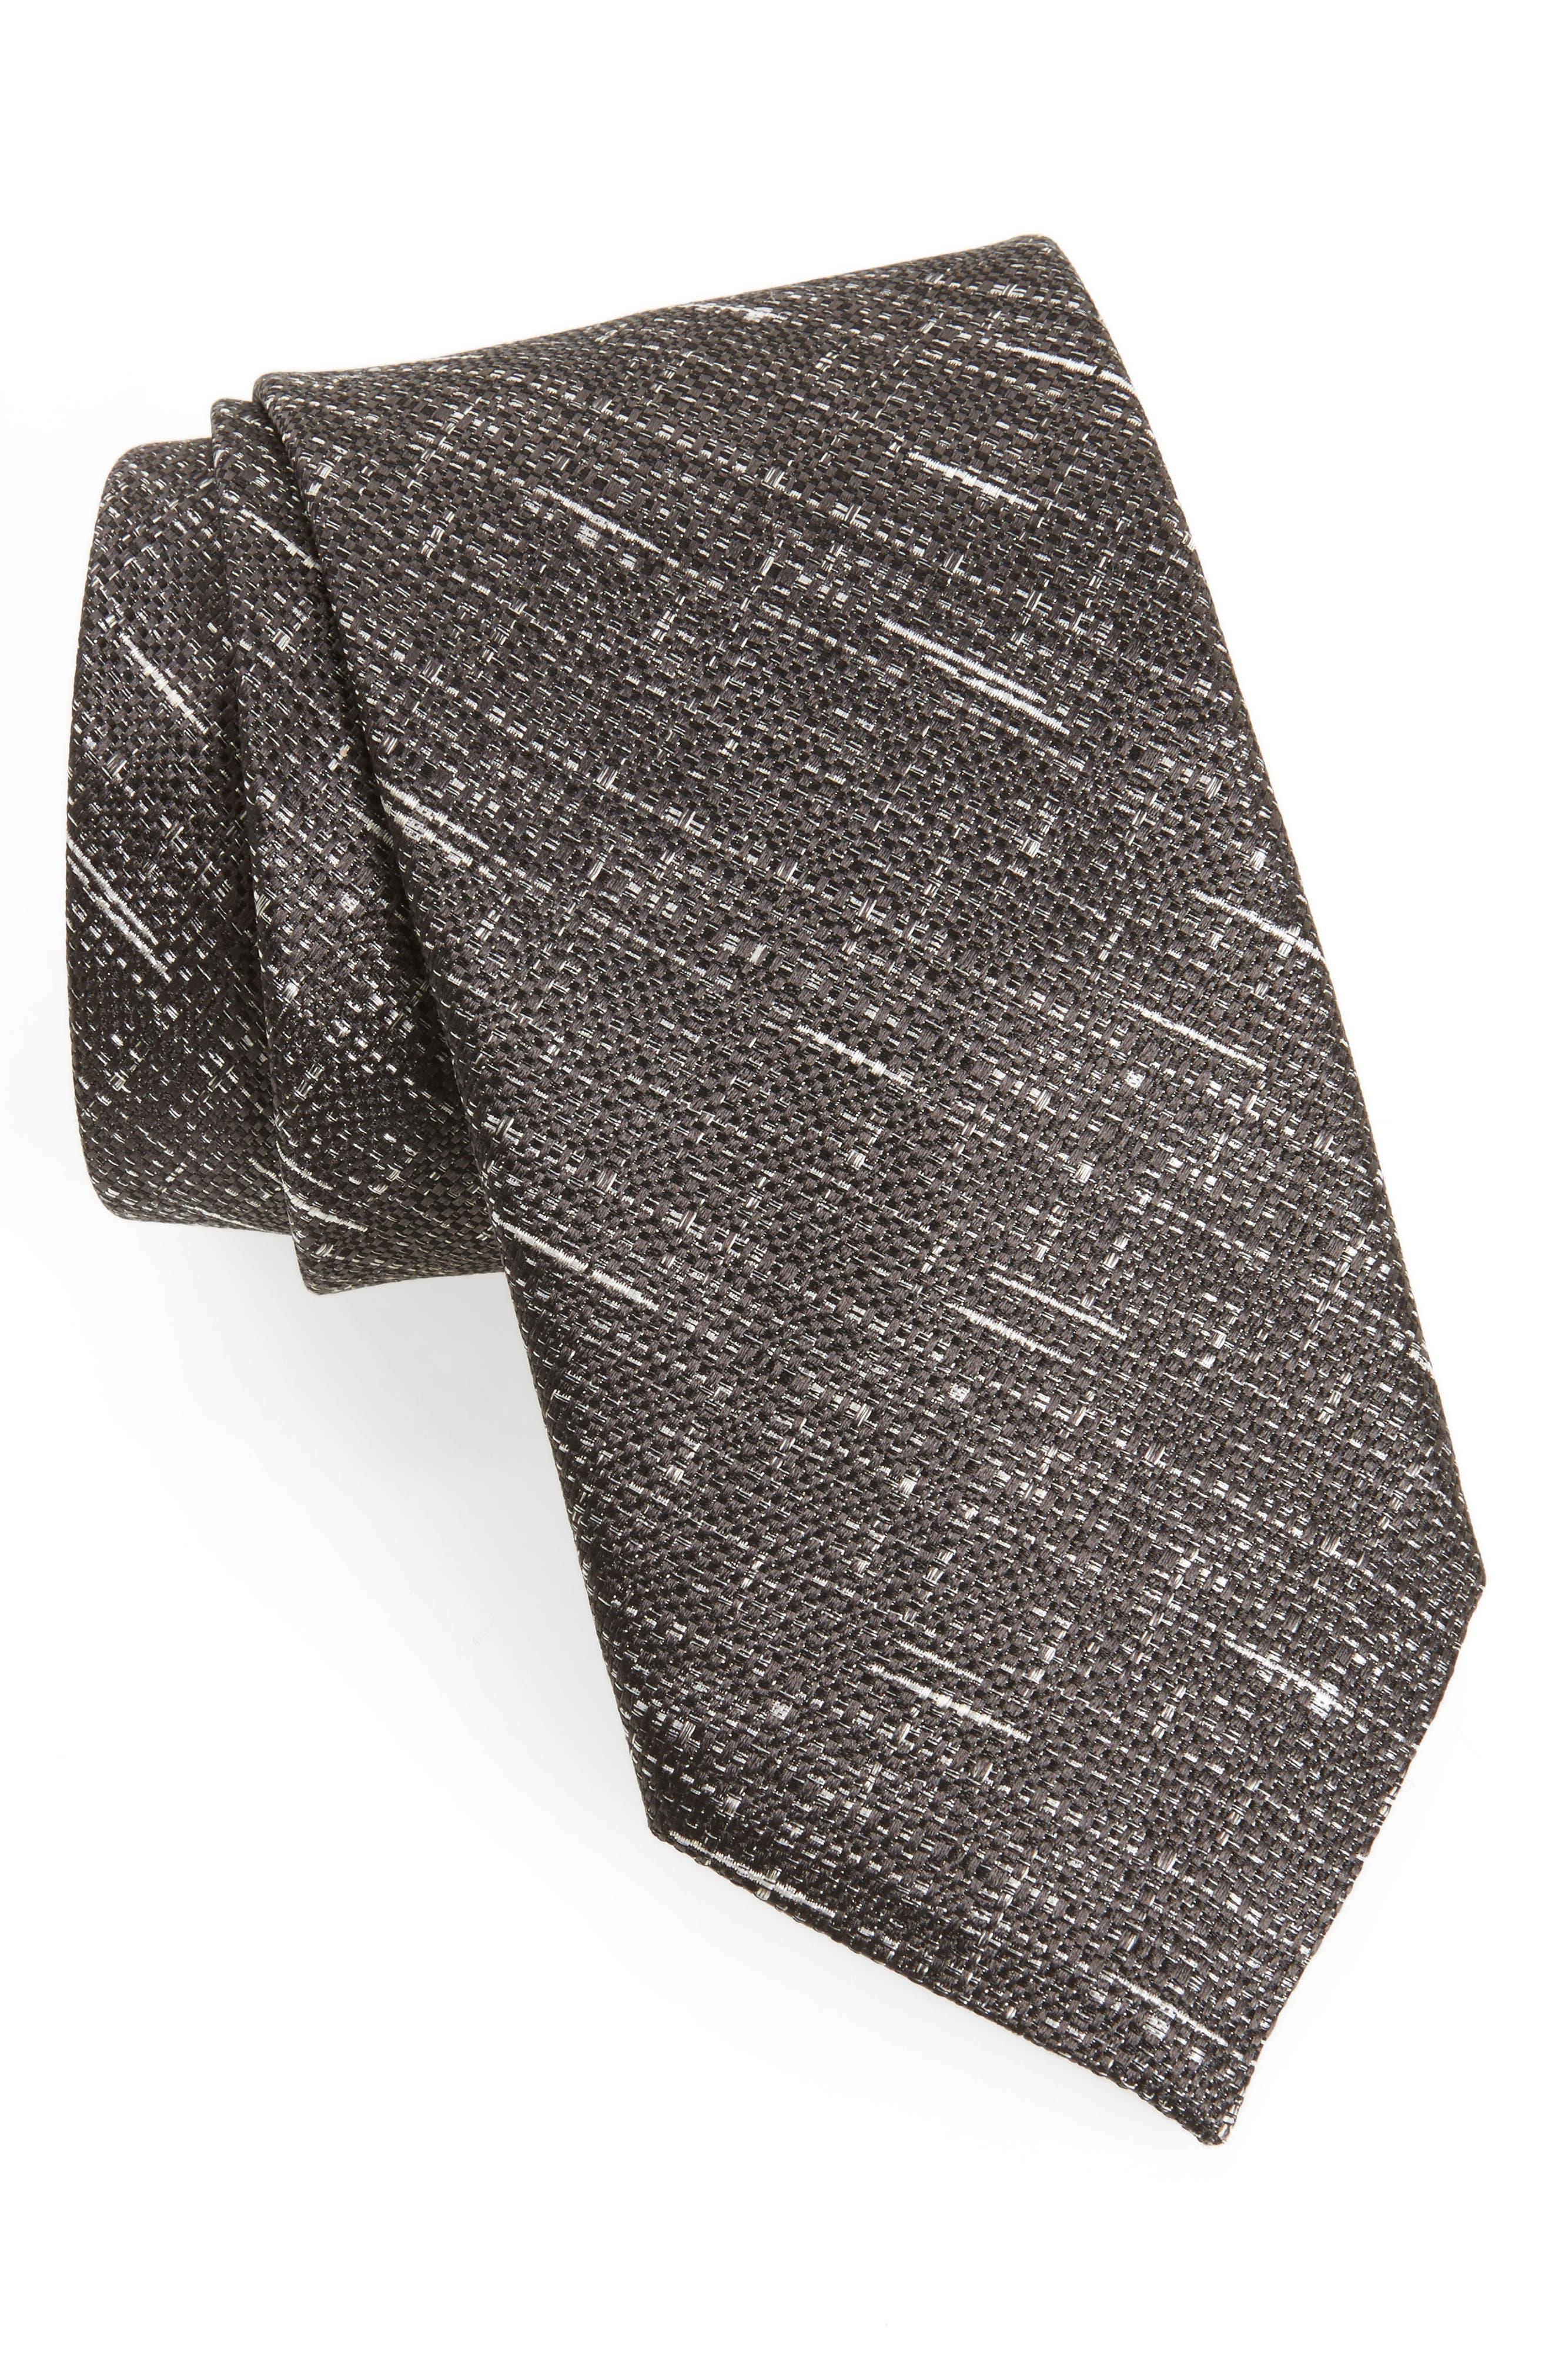 Main Image - Canali Textured Silk Tie